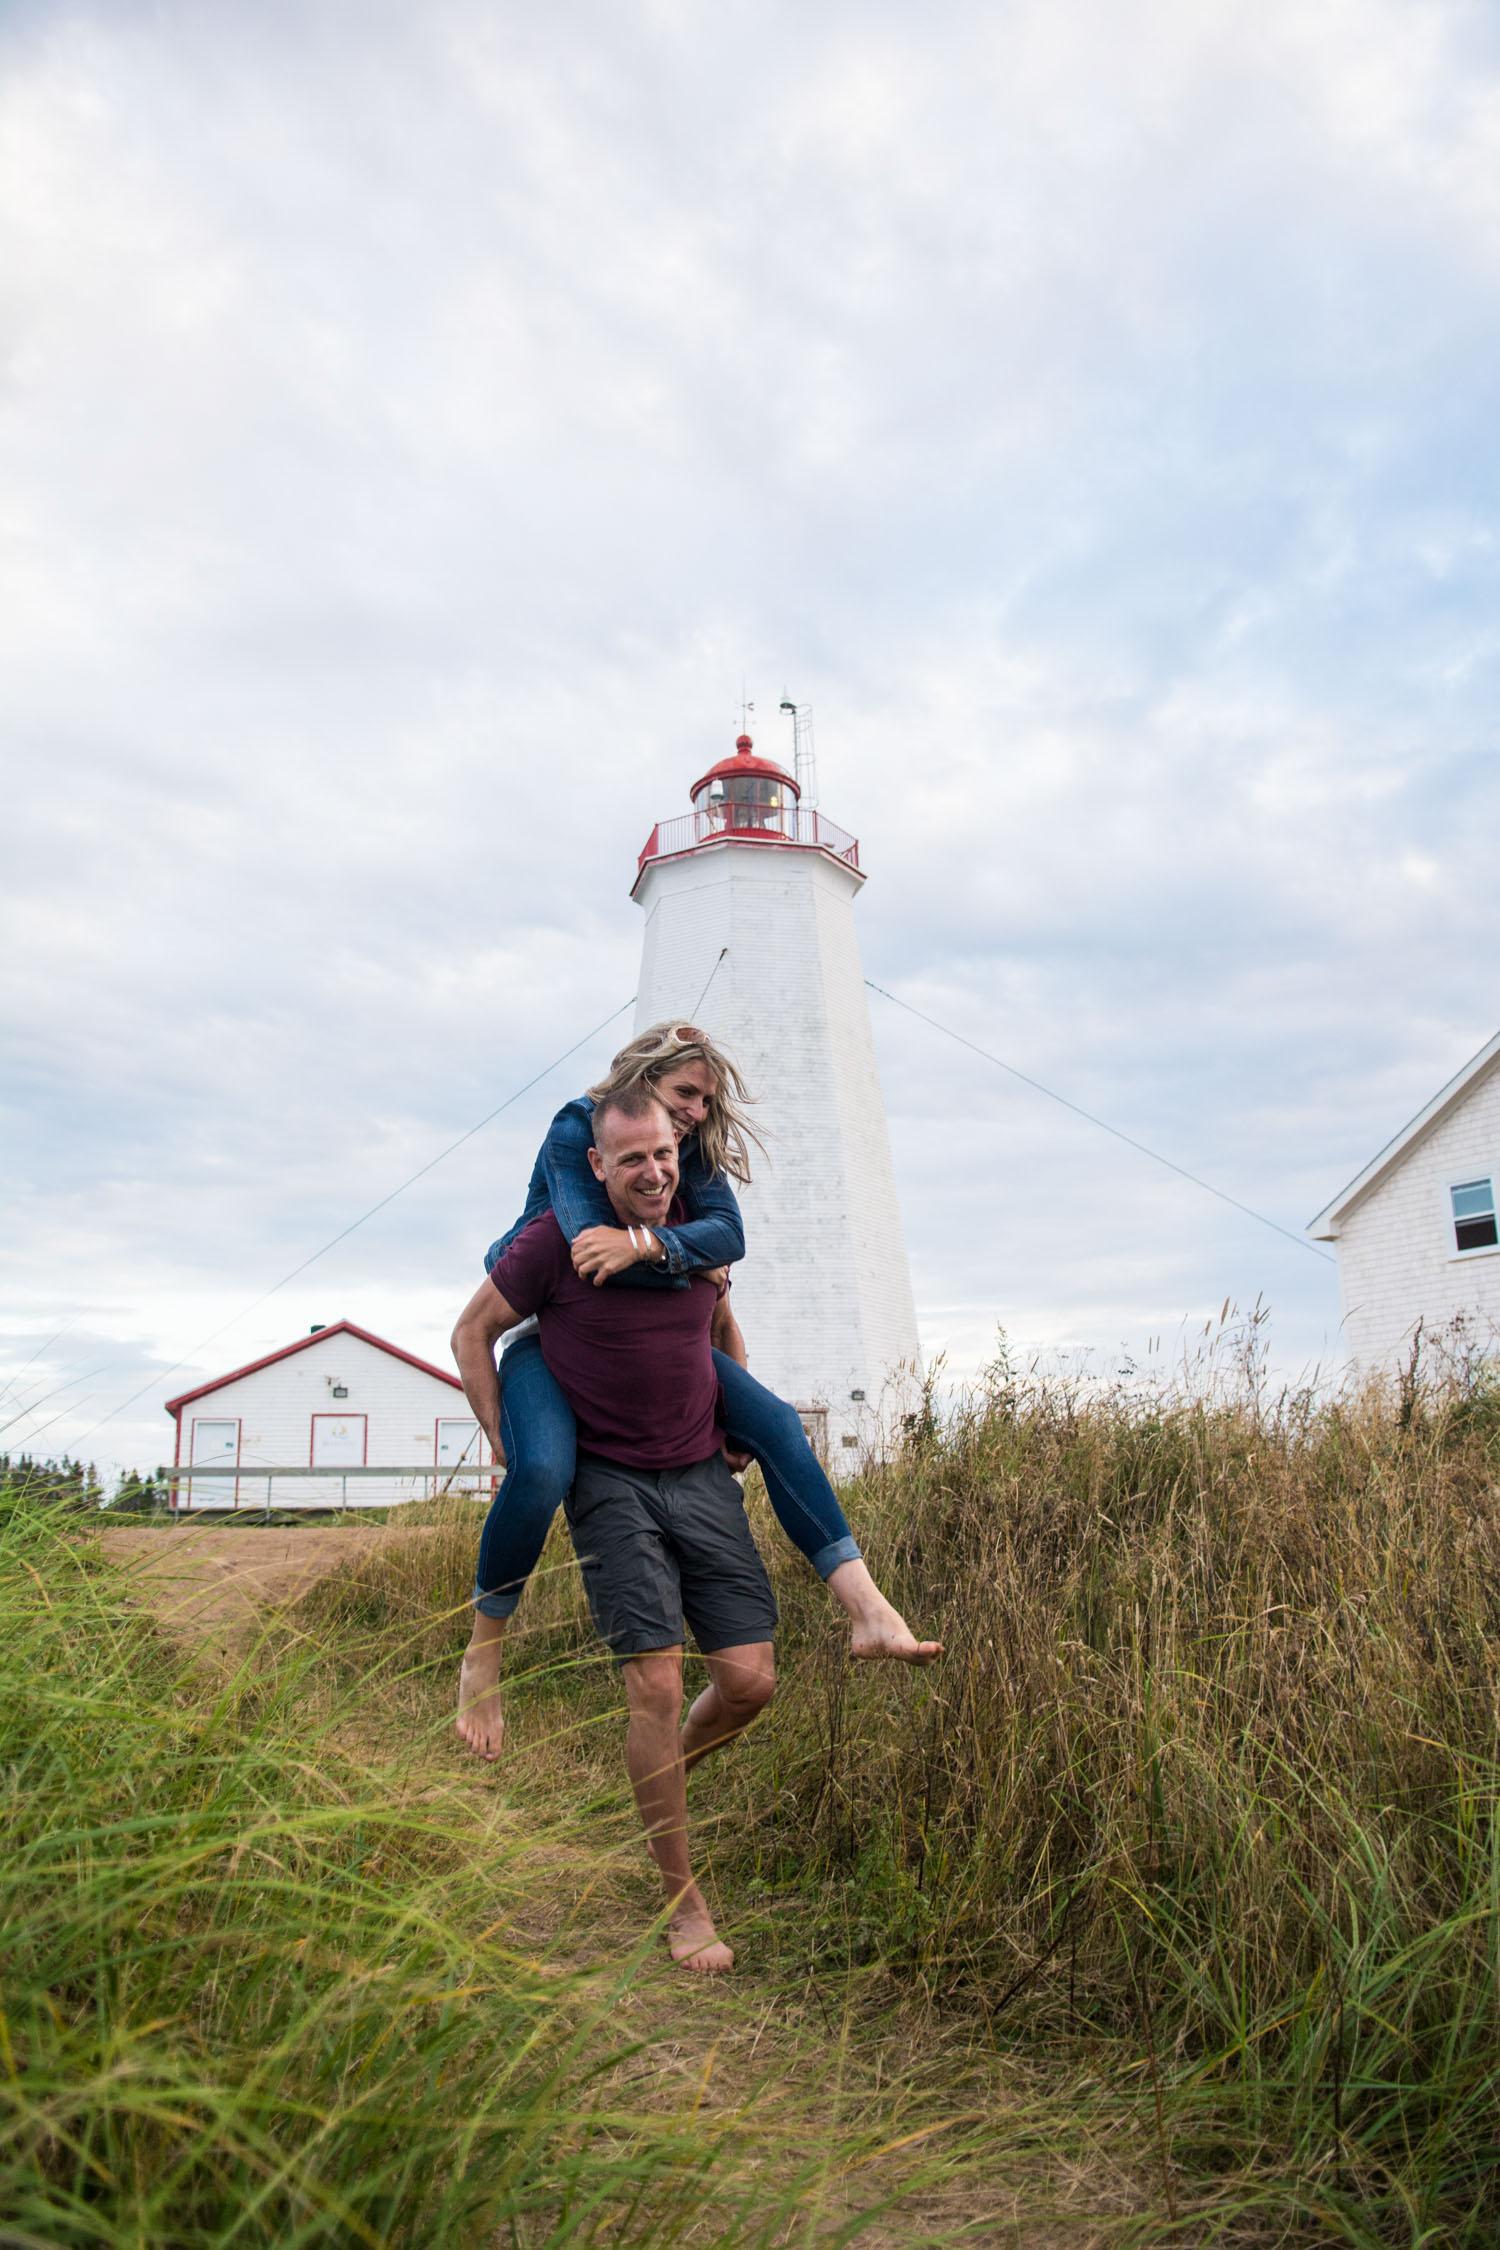 aug10-15 2014-Tourism New Brunswick-T4G Kick-summer 2014-Miramichi-Bathurst-Caraquet-Shippagan-Miscou Island-NB-web res jpg-photo by Aaron McKenzie Fraser-www.amfraser.com_AMF9625.jpg